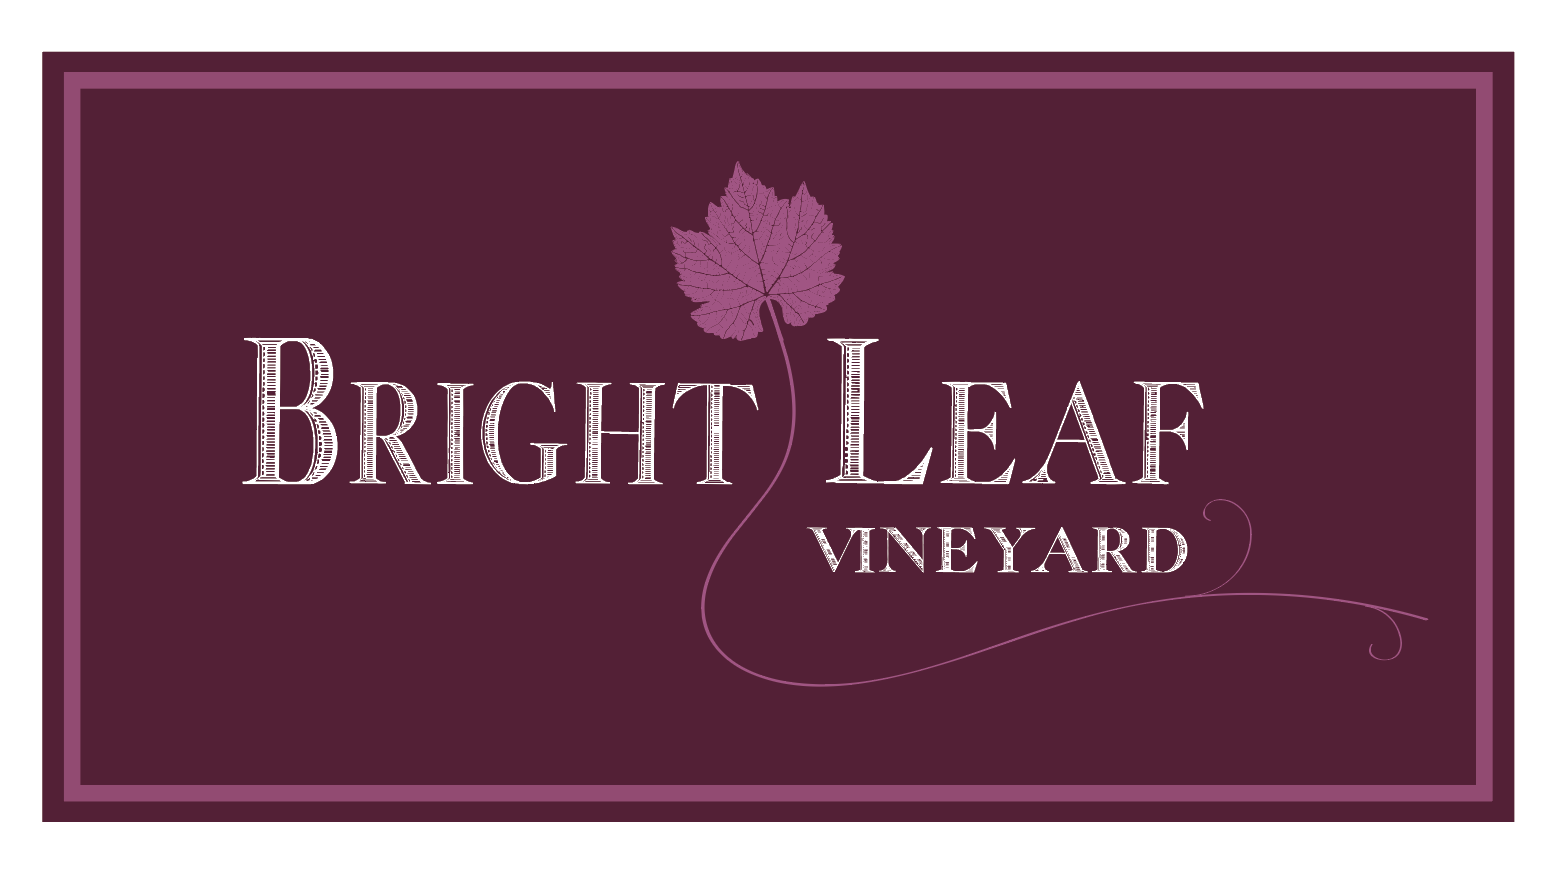 10 Boxed Logo on Burgundy